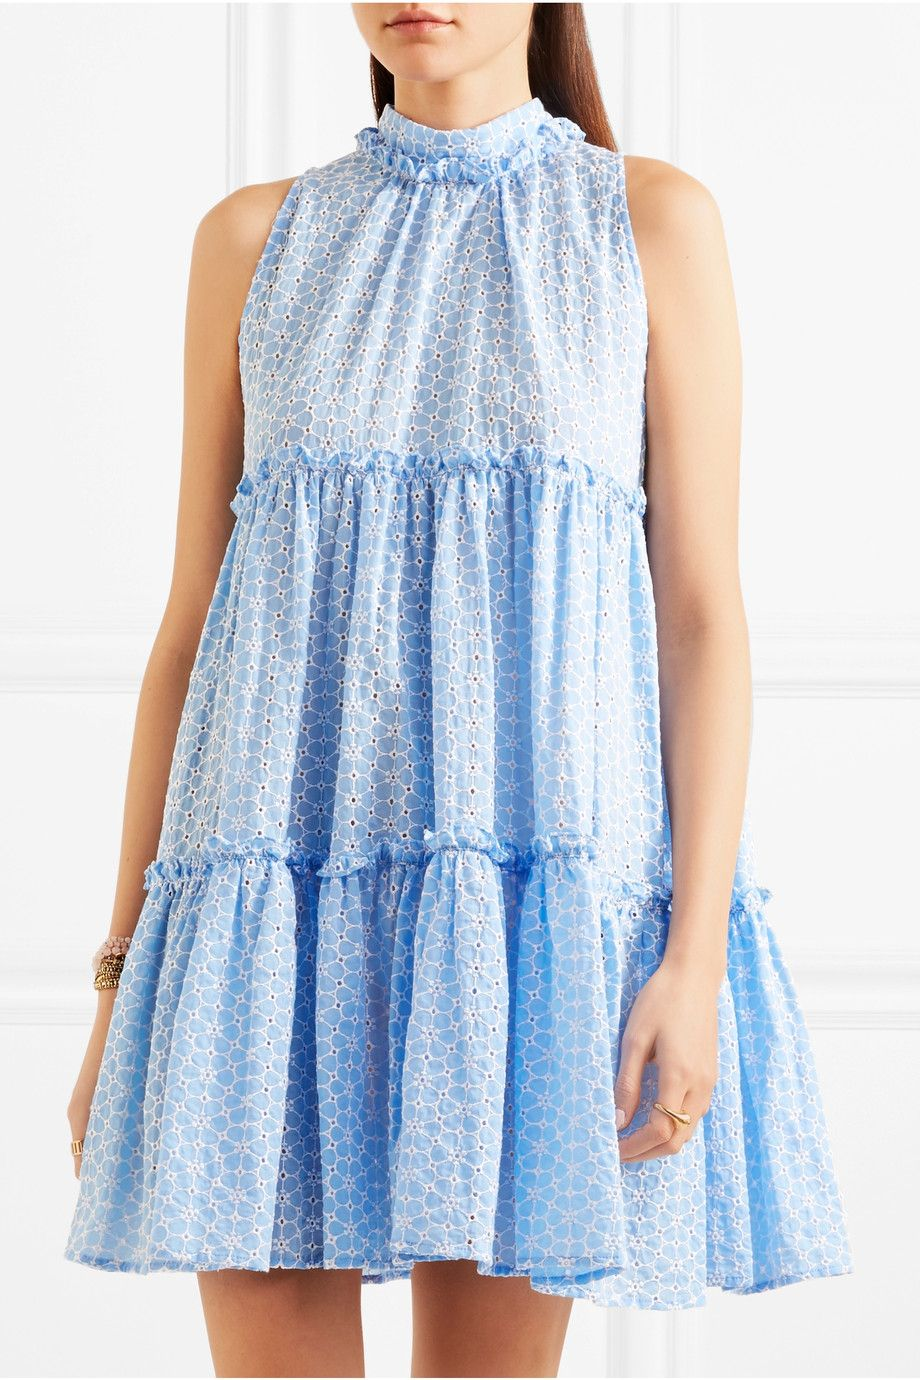 Erica Ruffled Broderie Anglaise Cotton Mini Dress - Light blue Lisa Marie Fernandez Discount Choice DaF3h42x46